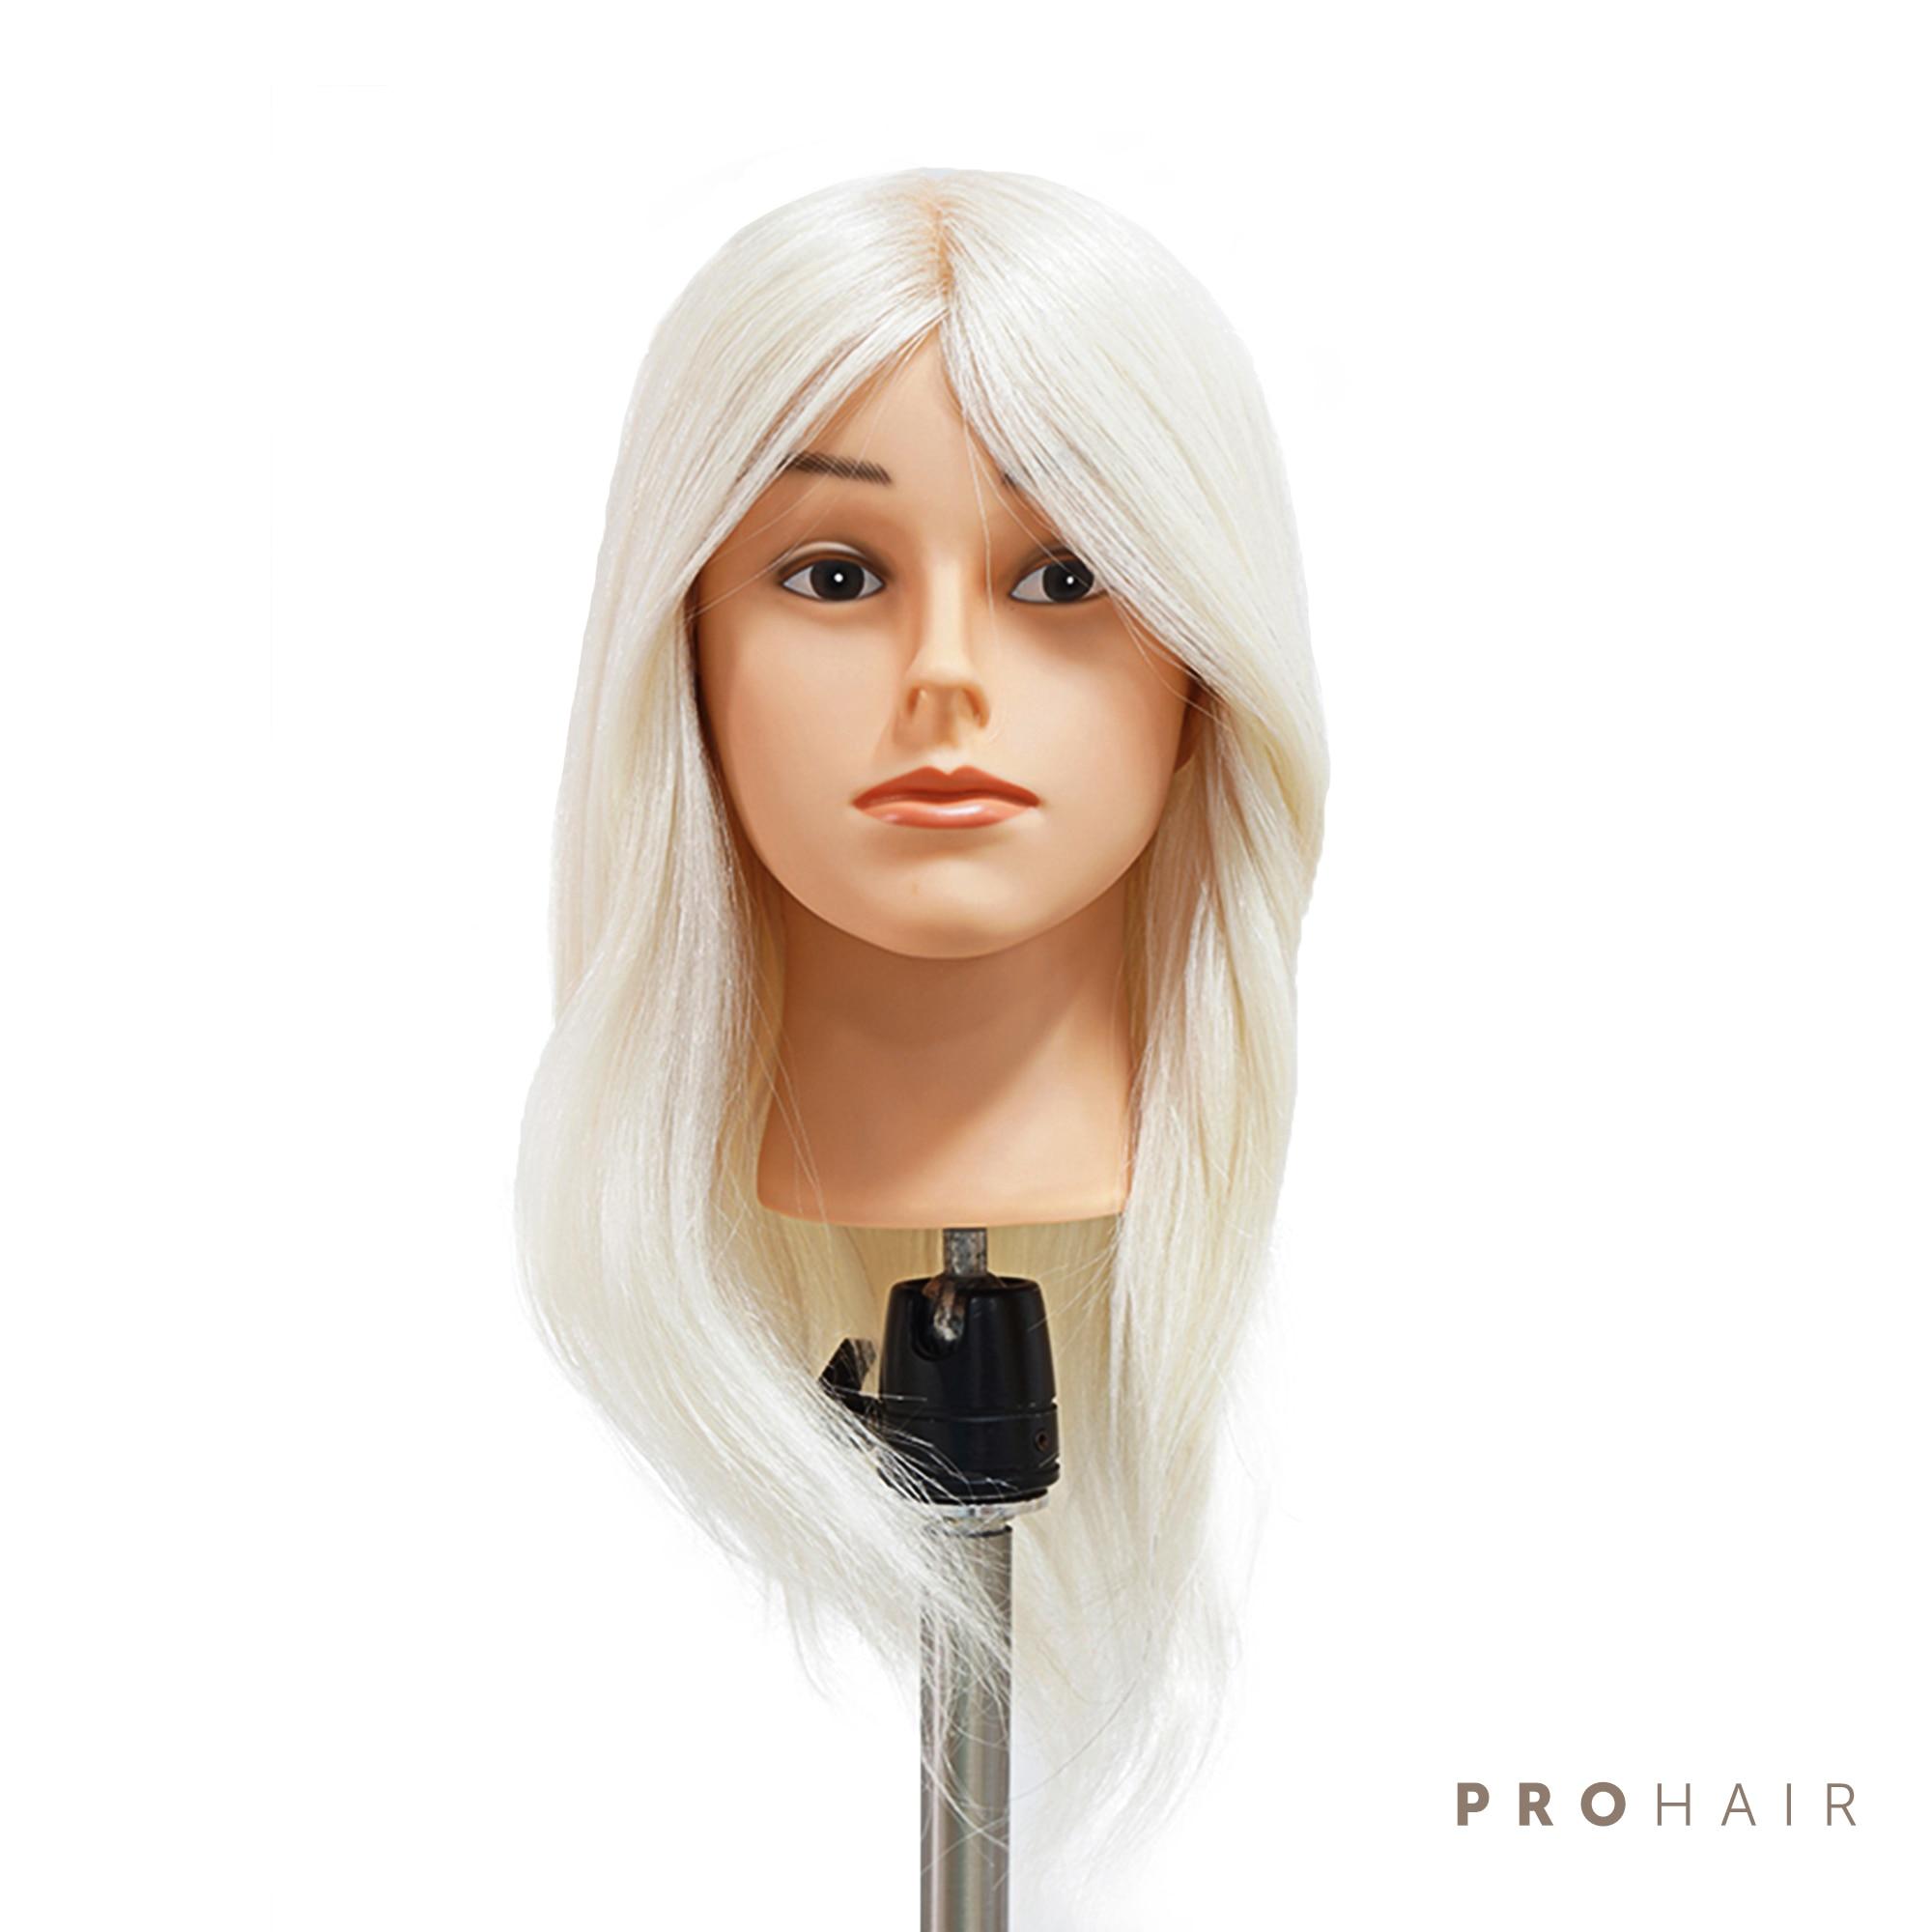 PROHAIR 40CM 16 100 White Goat Hair Training Head Salon Female Mannequin Head Hairdressing Practice Training